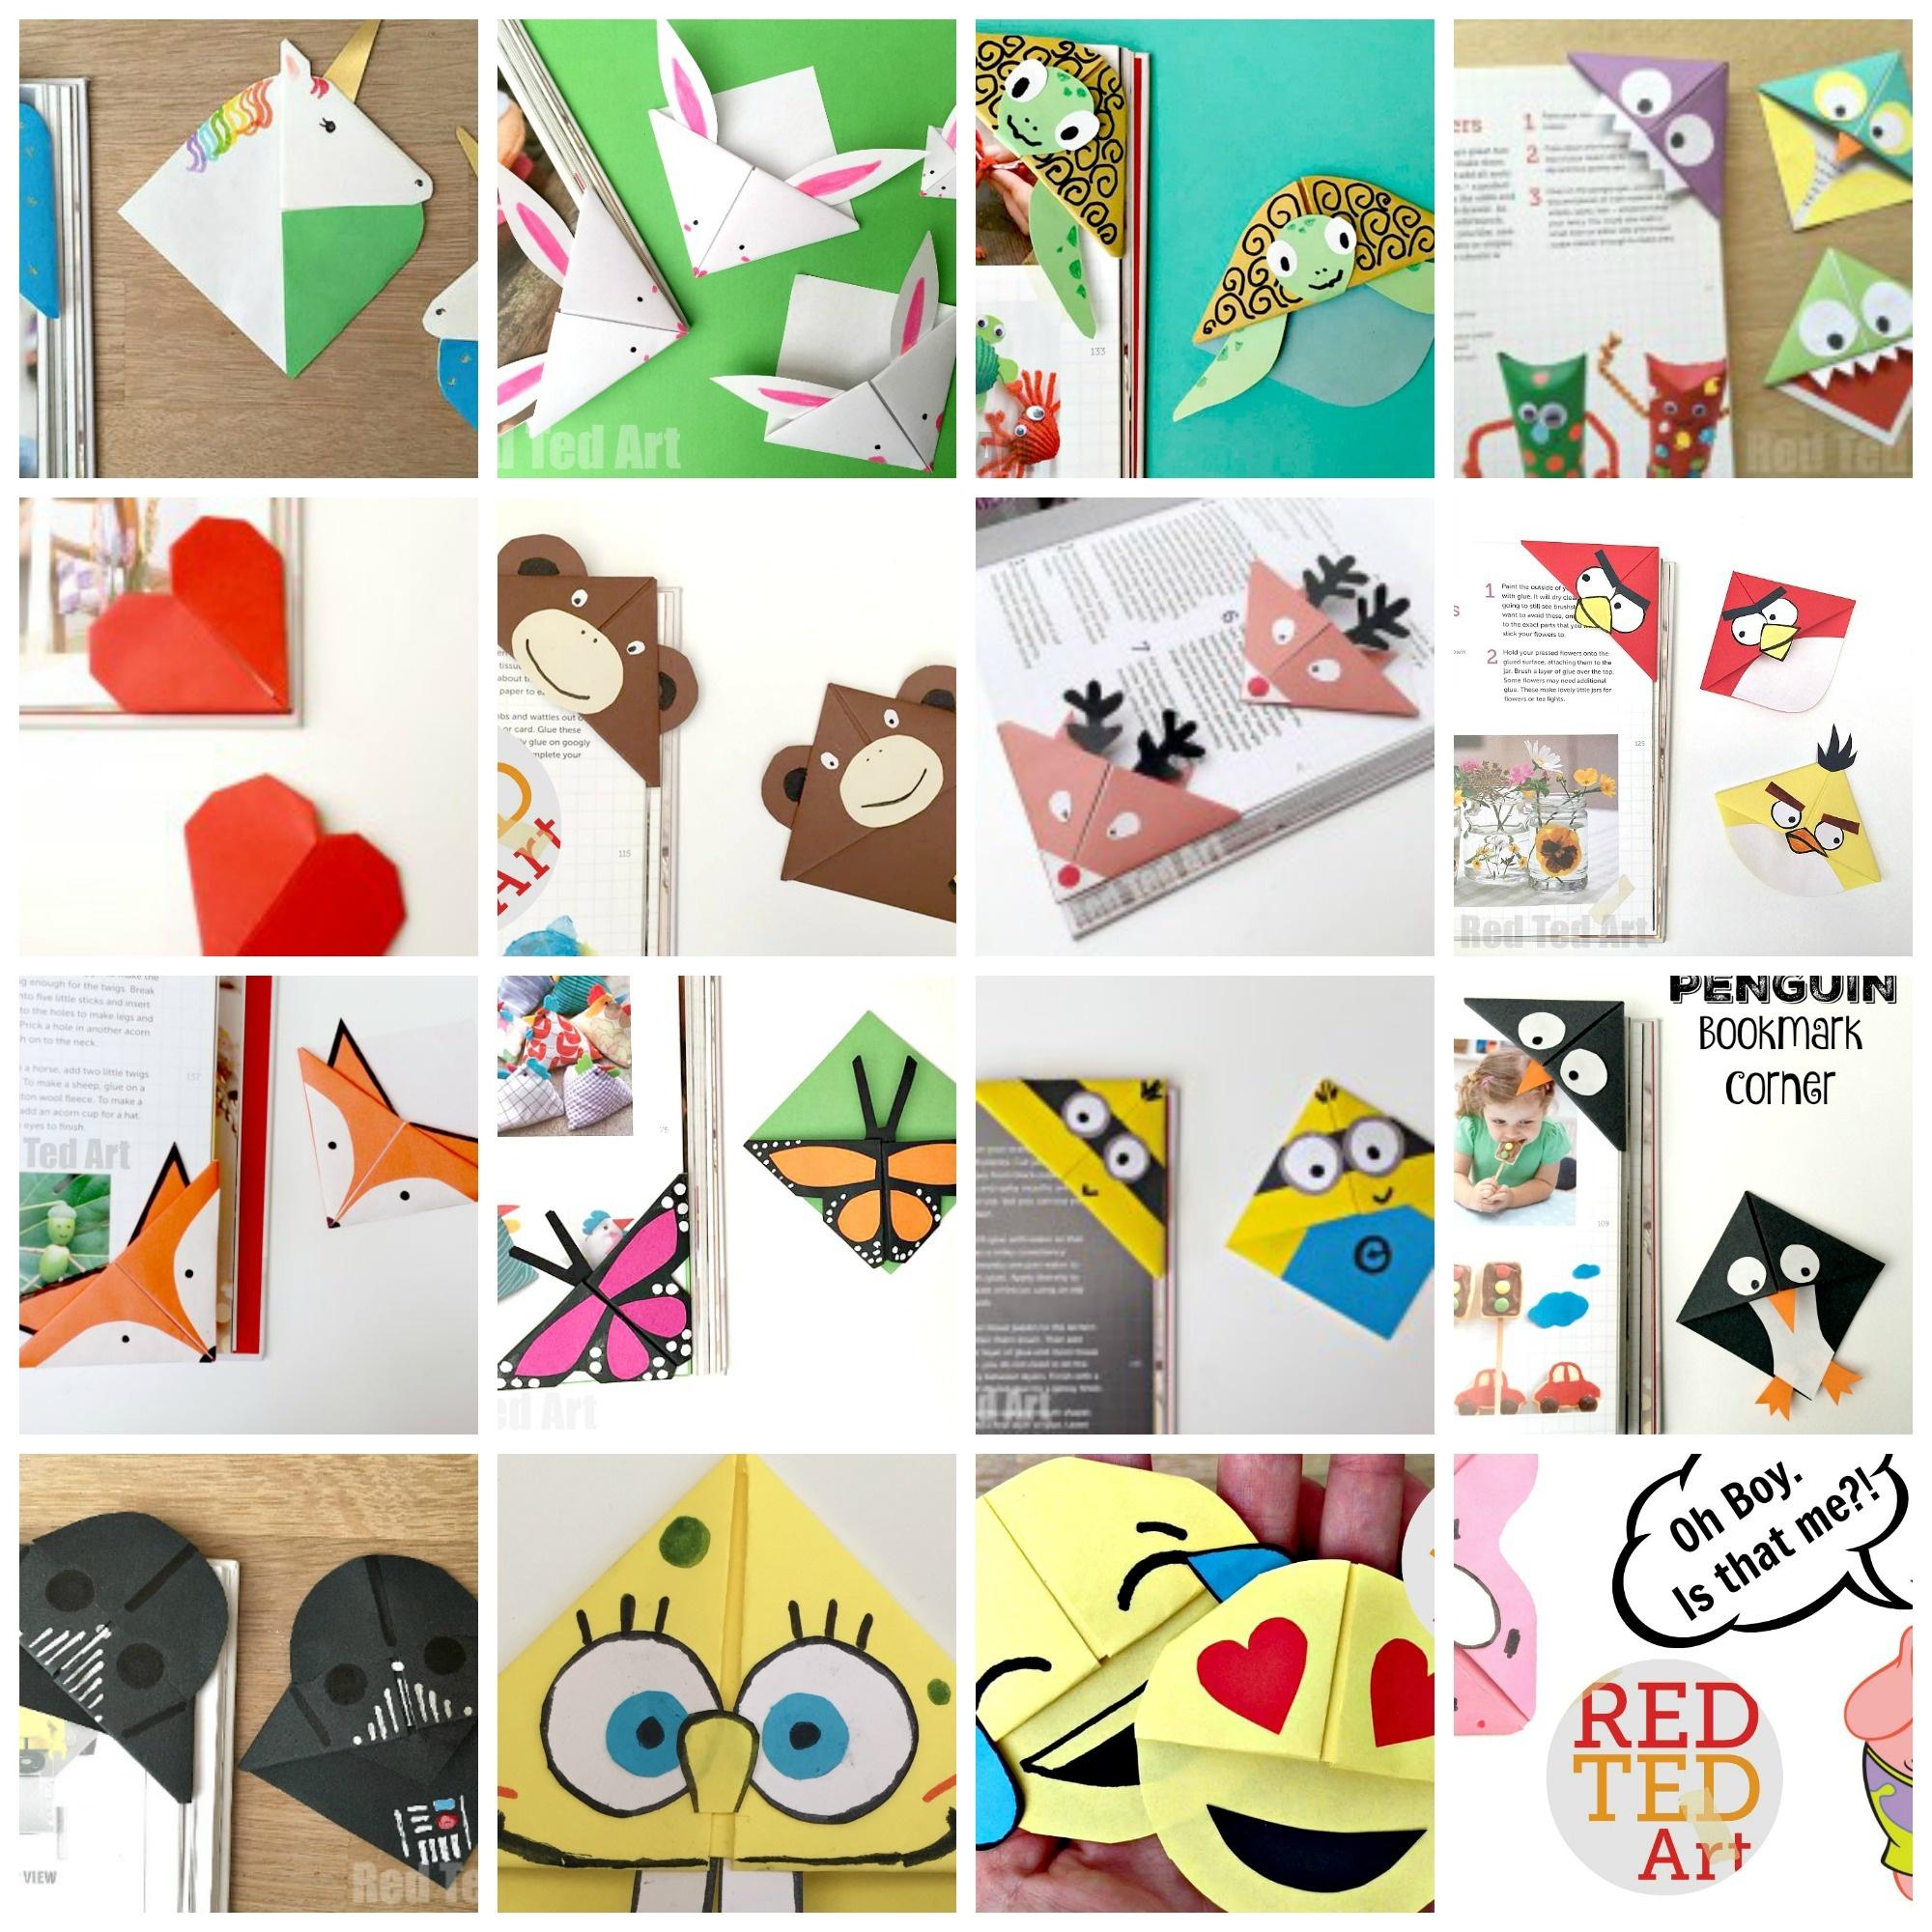 Corner Bookmarks Designs - How Make Origami Bookmark Corners - - Free Printable Dragon Bookmarks